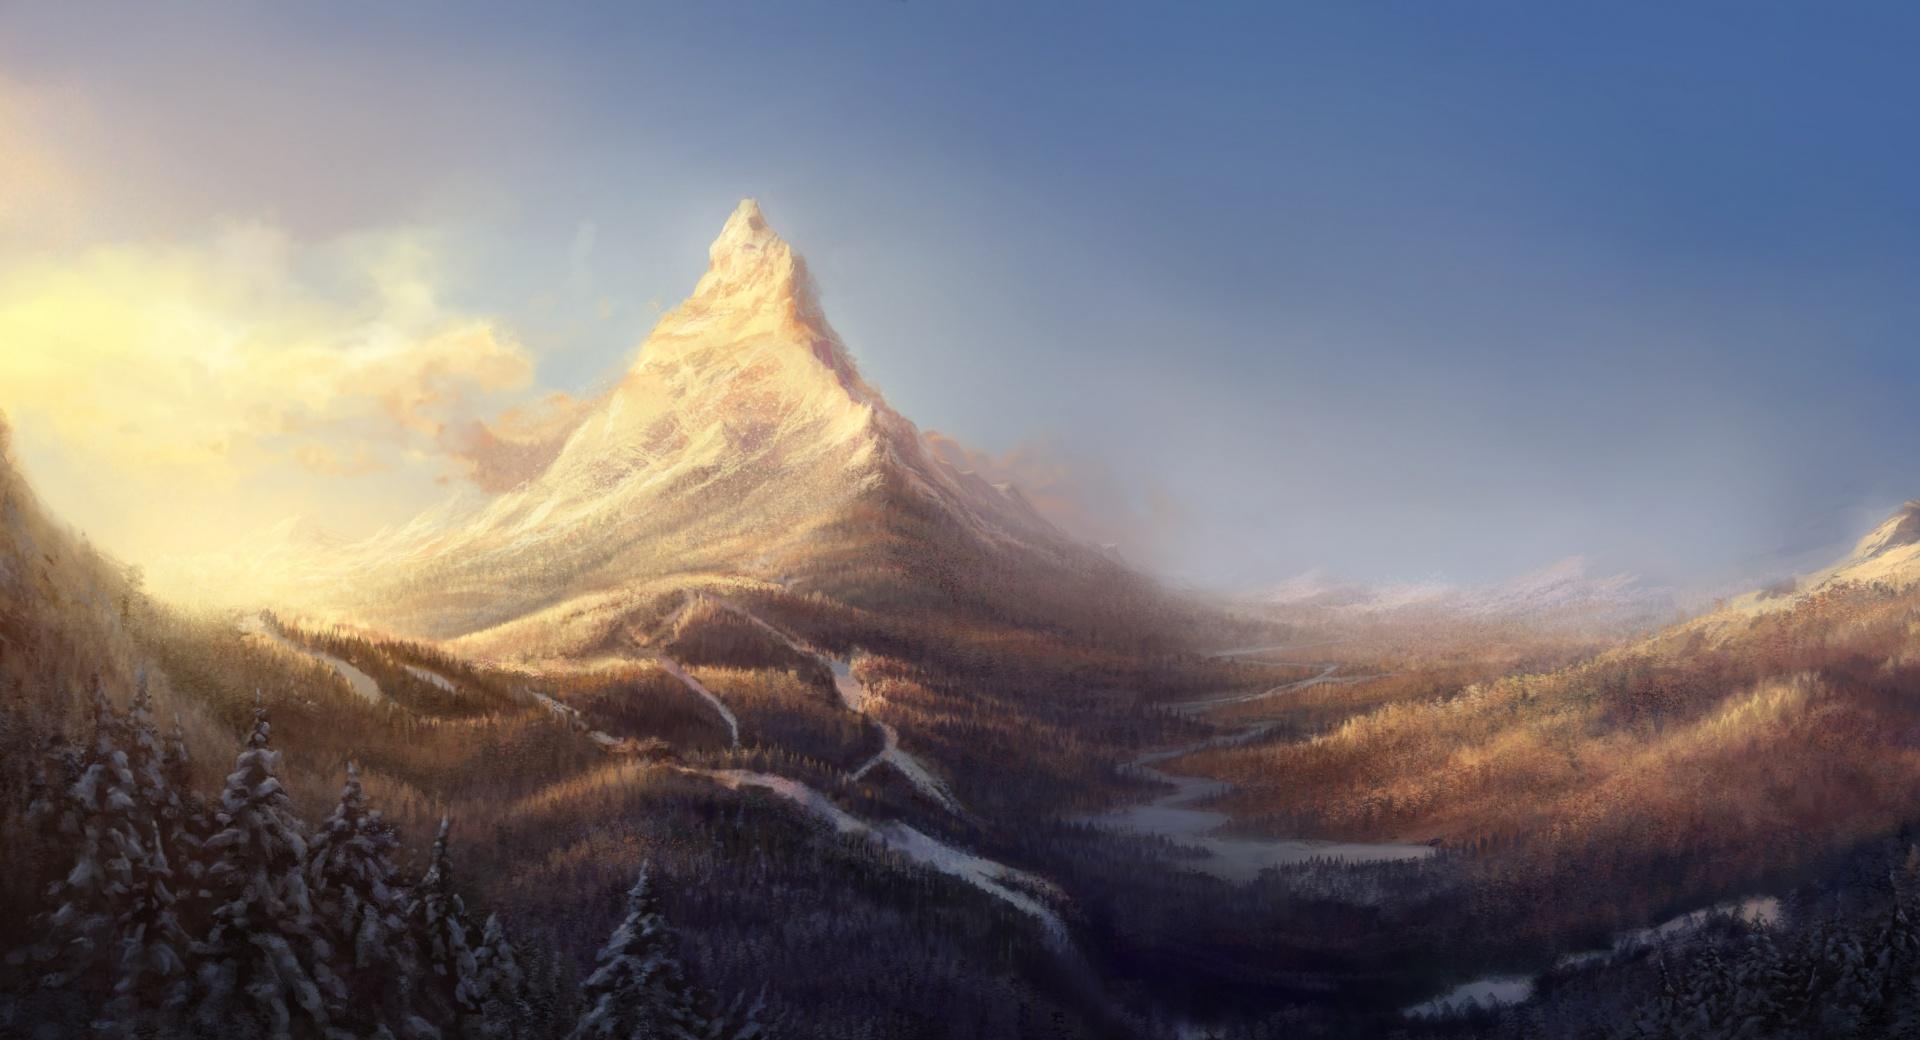 Mountain Peak wallpapers HD quality